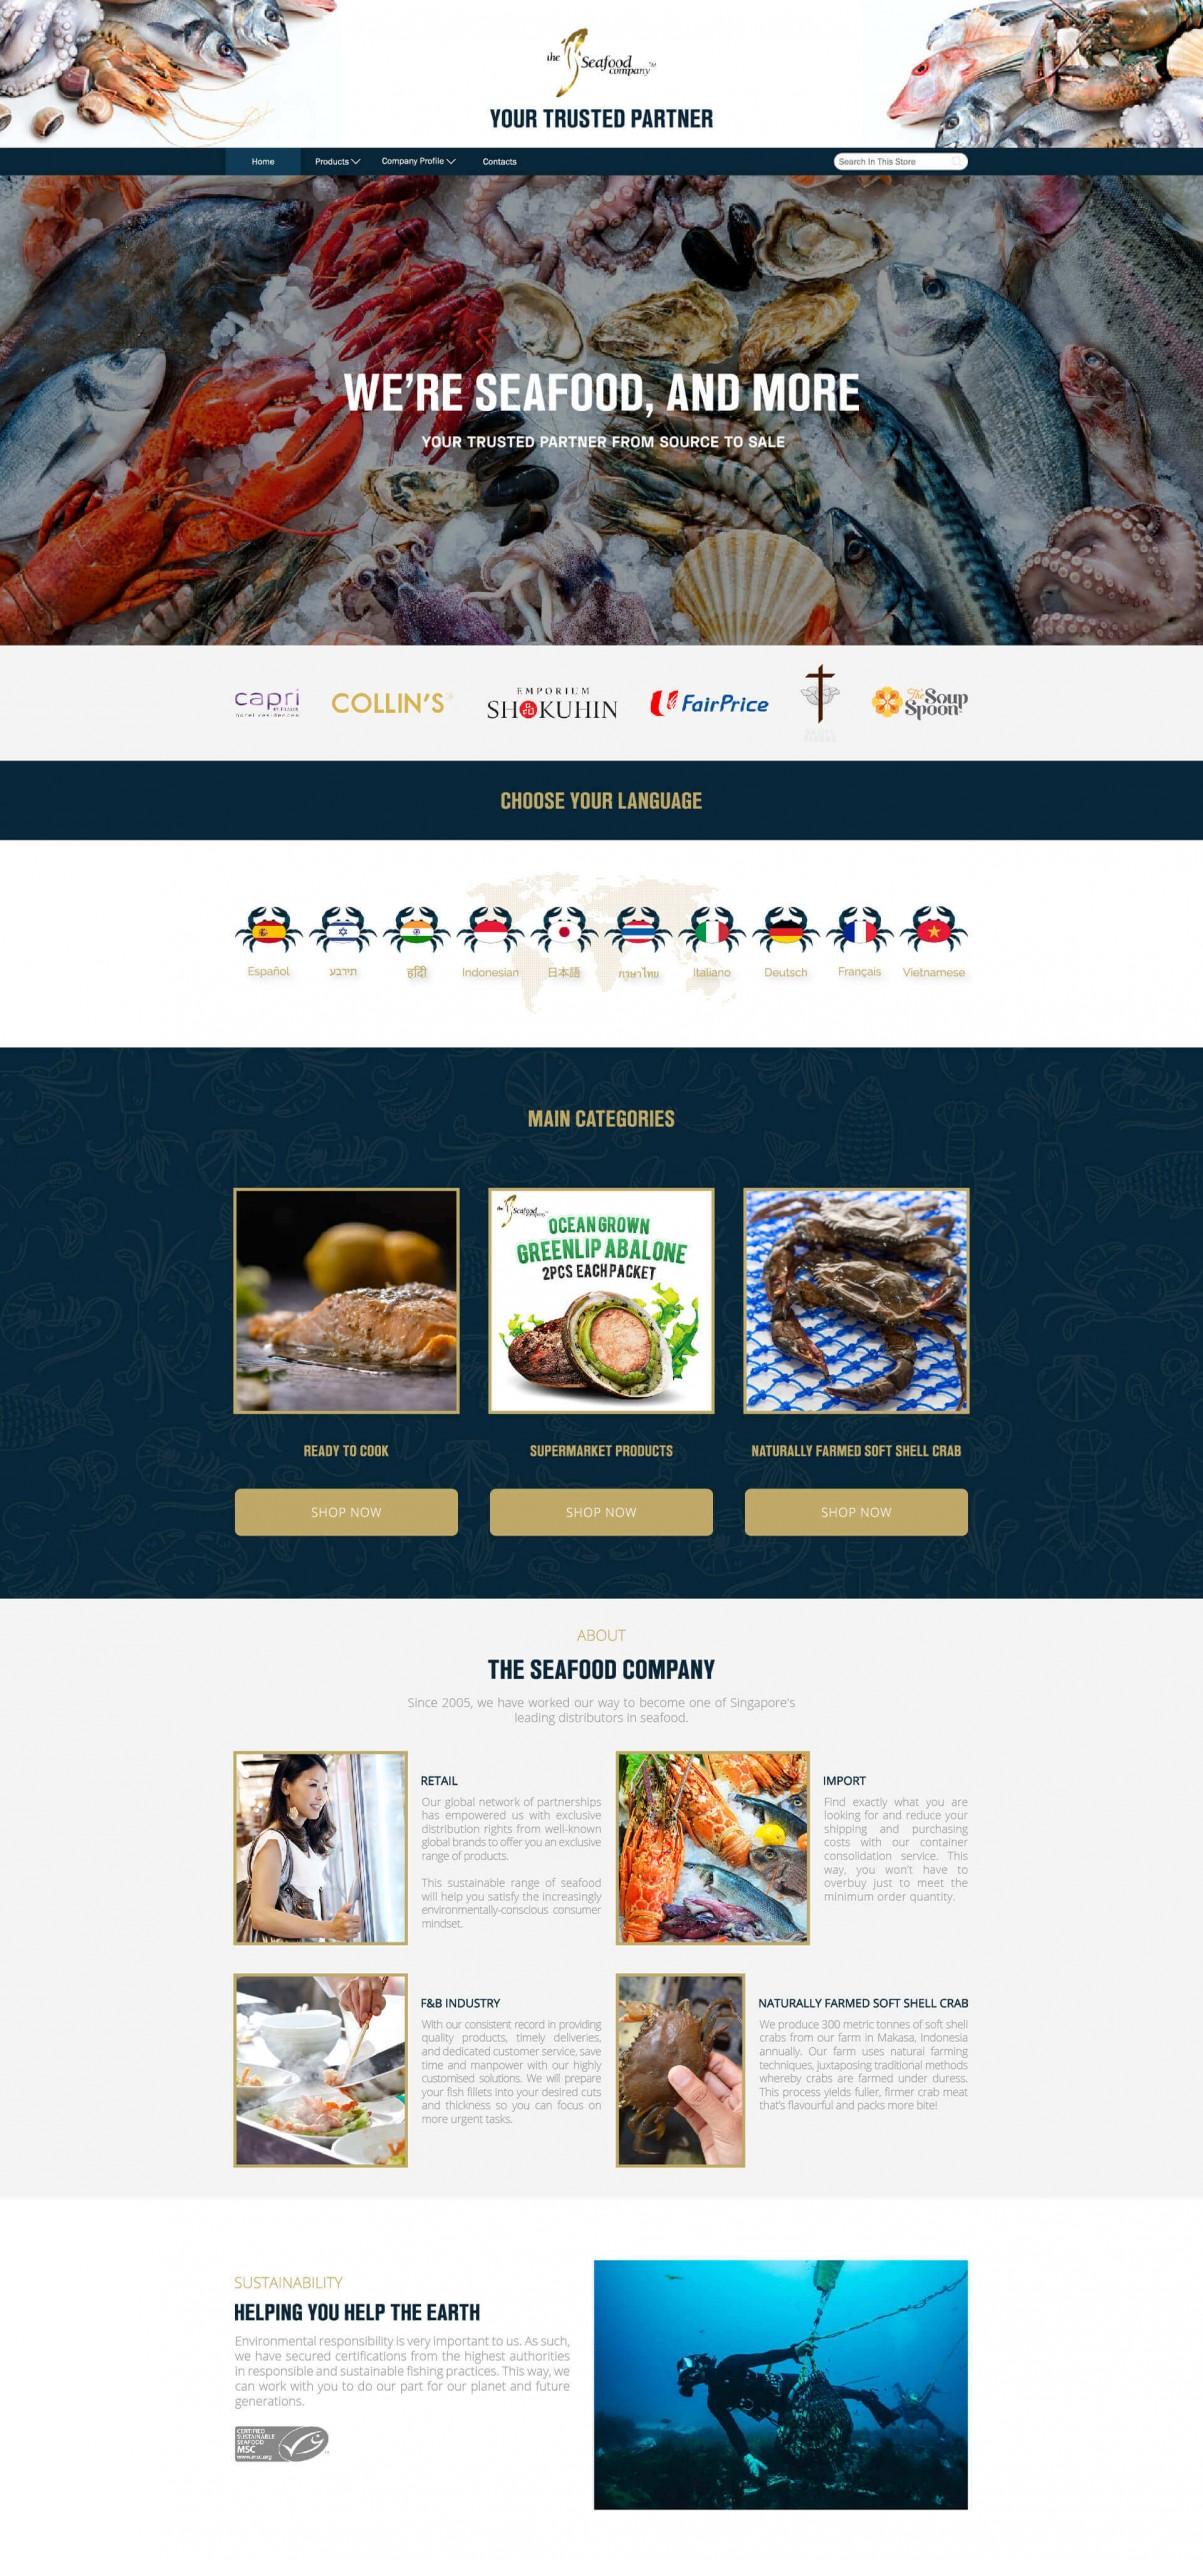 The Seafood Company PTE LTD